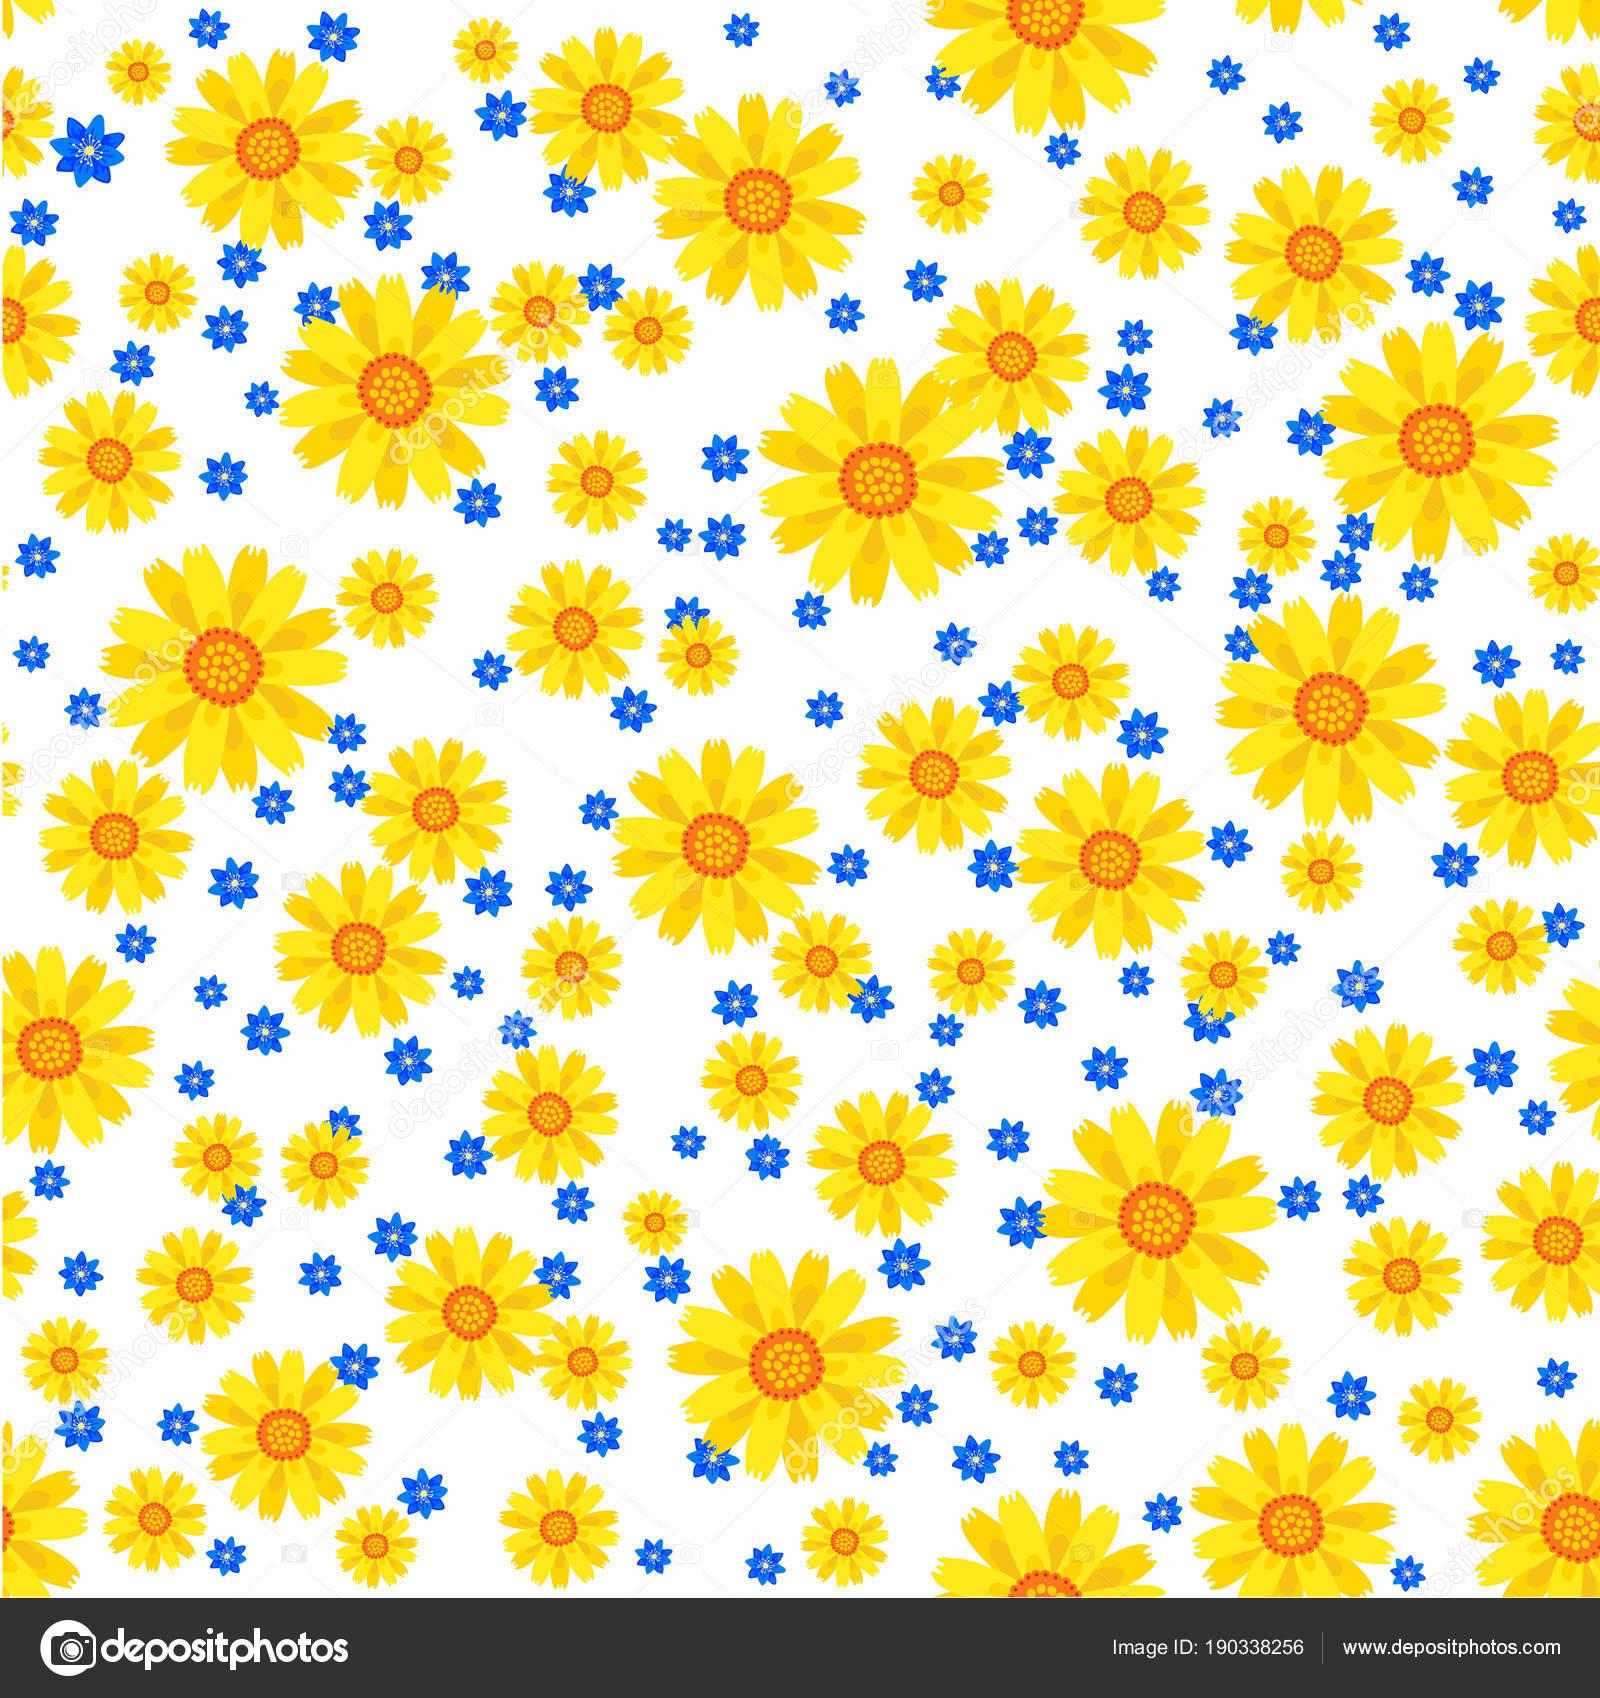 Lovely floral seamless pattern vector illustration with yellow and lovely floral seamless pattern vector illustration with yellow and blue flowers stock vector izmirmasajfo